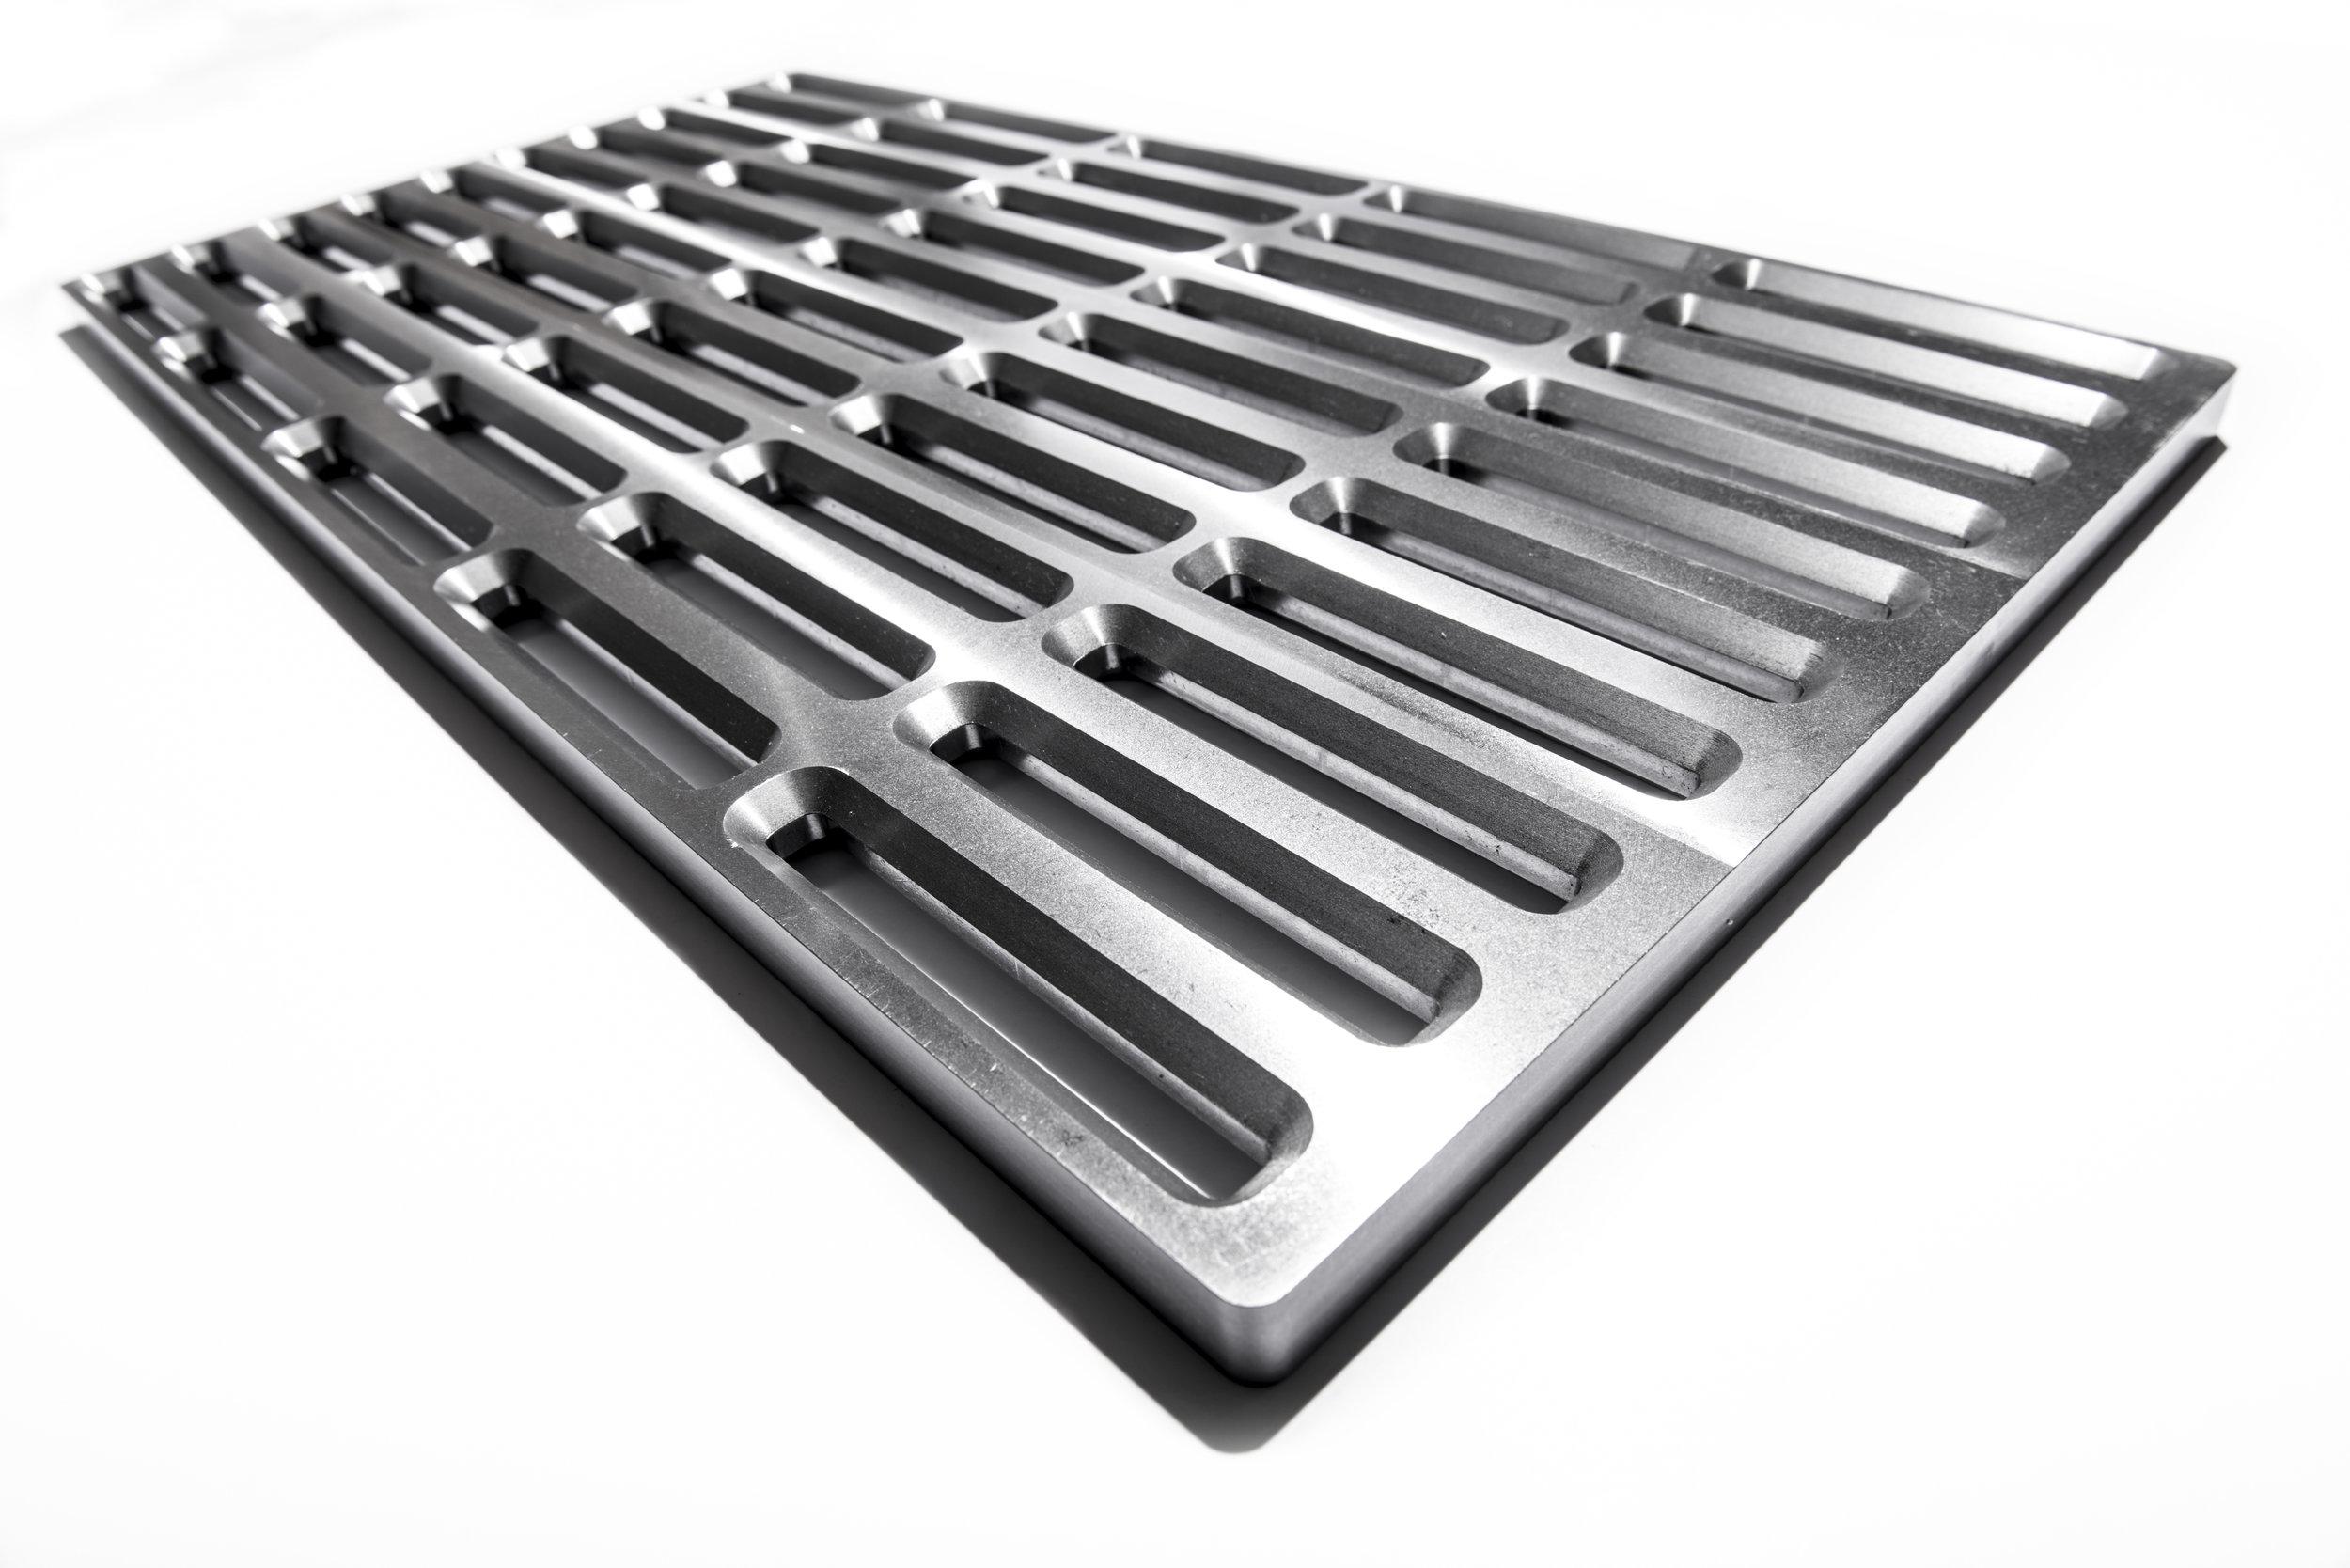 Optional Cast Iron Surfaces